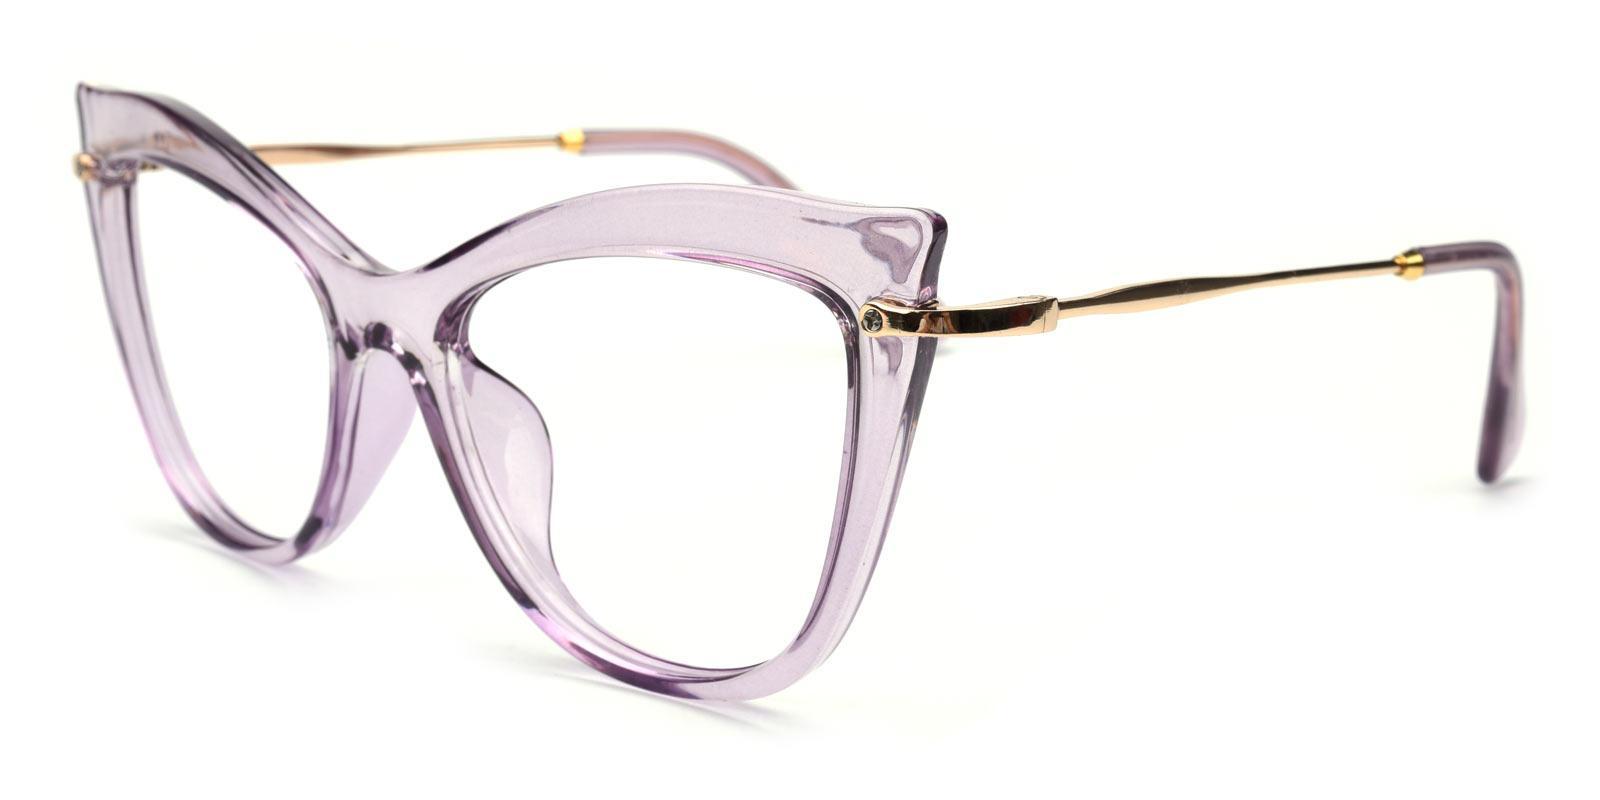 Agatha-Purple-Cat-Combination-Eyeglasses-additional1